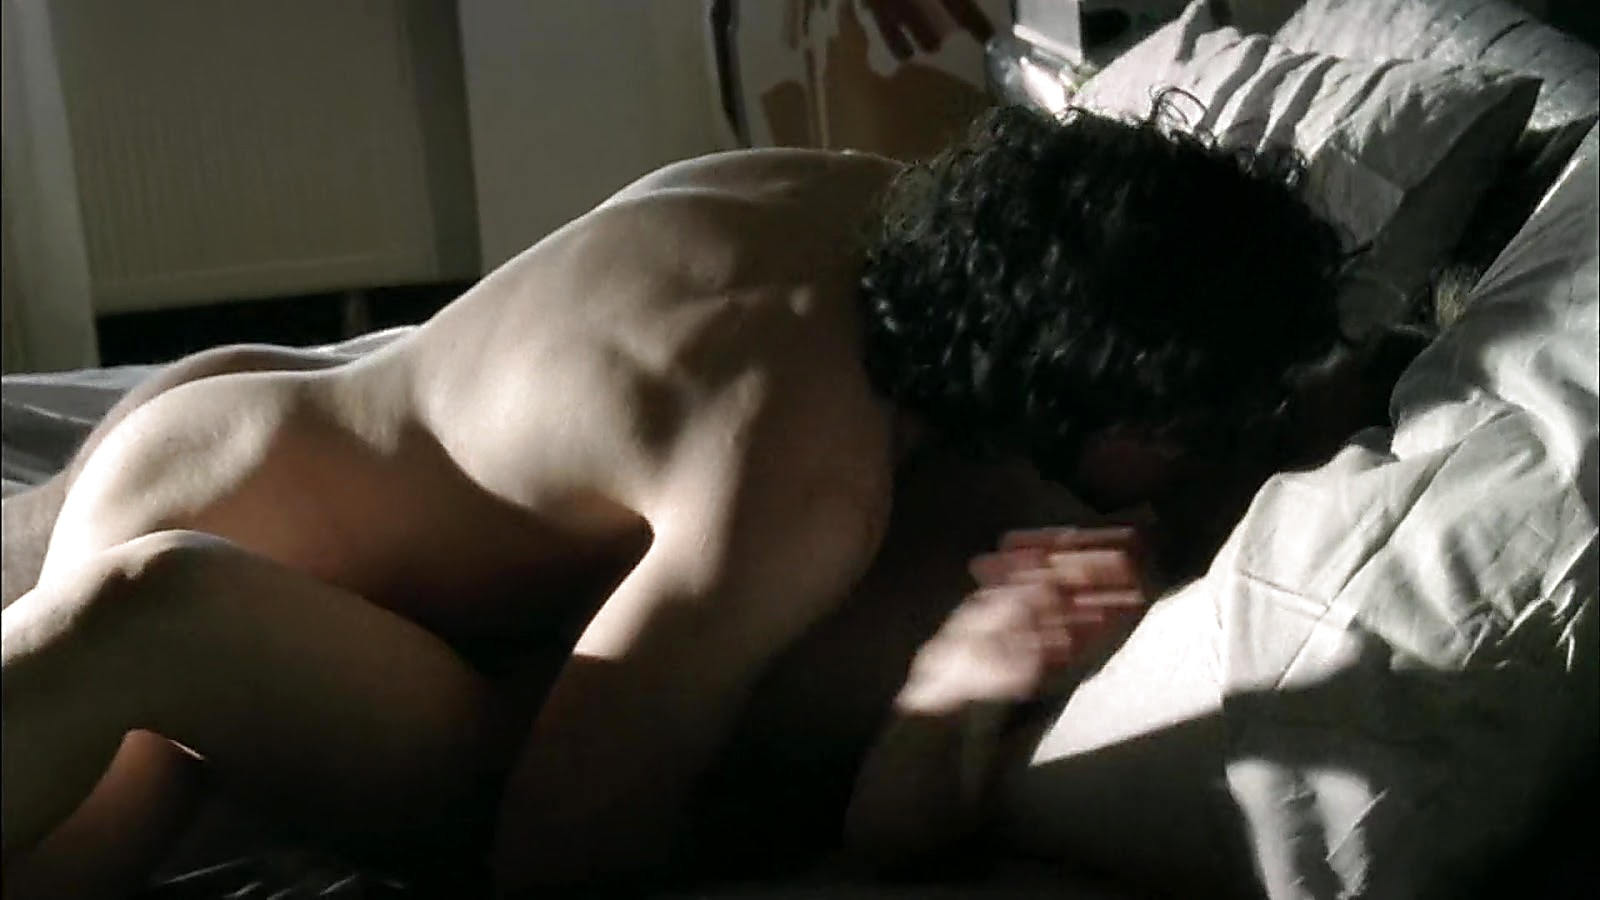 Francesco Montanari sexy shirtless scene March 14, 2020, 9am